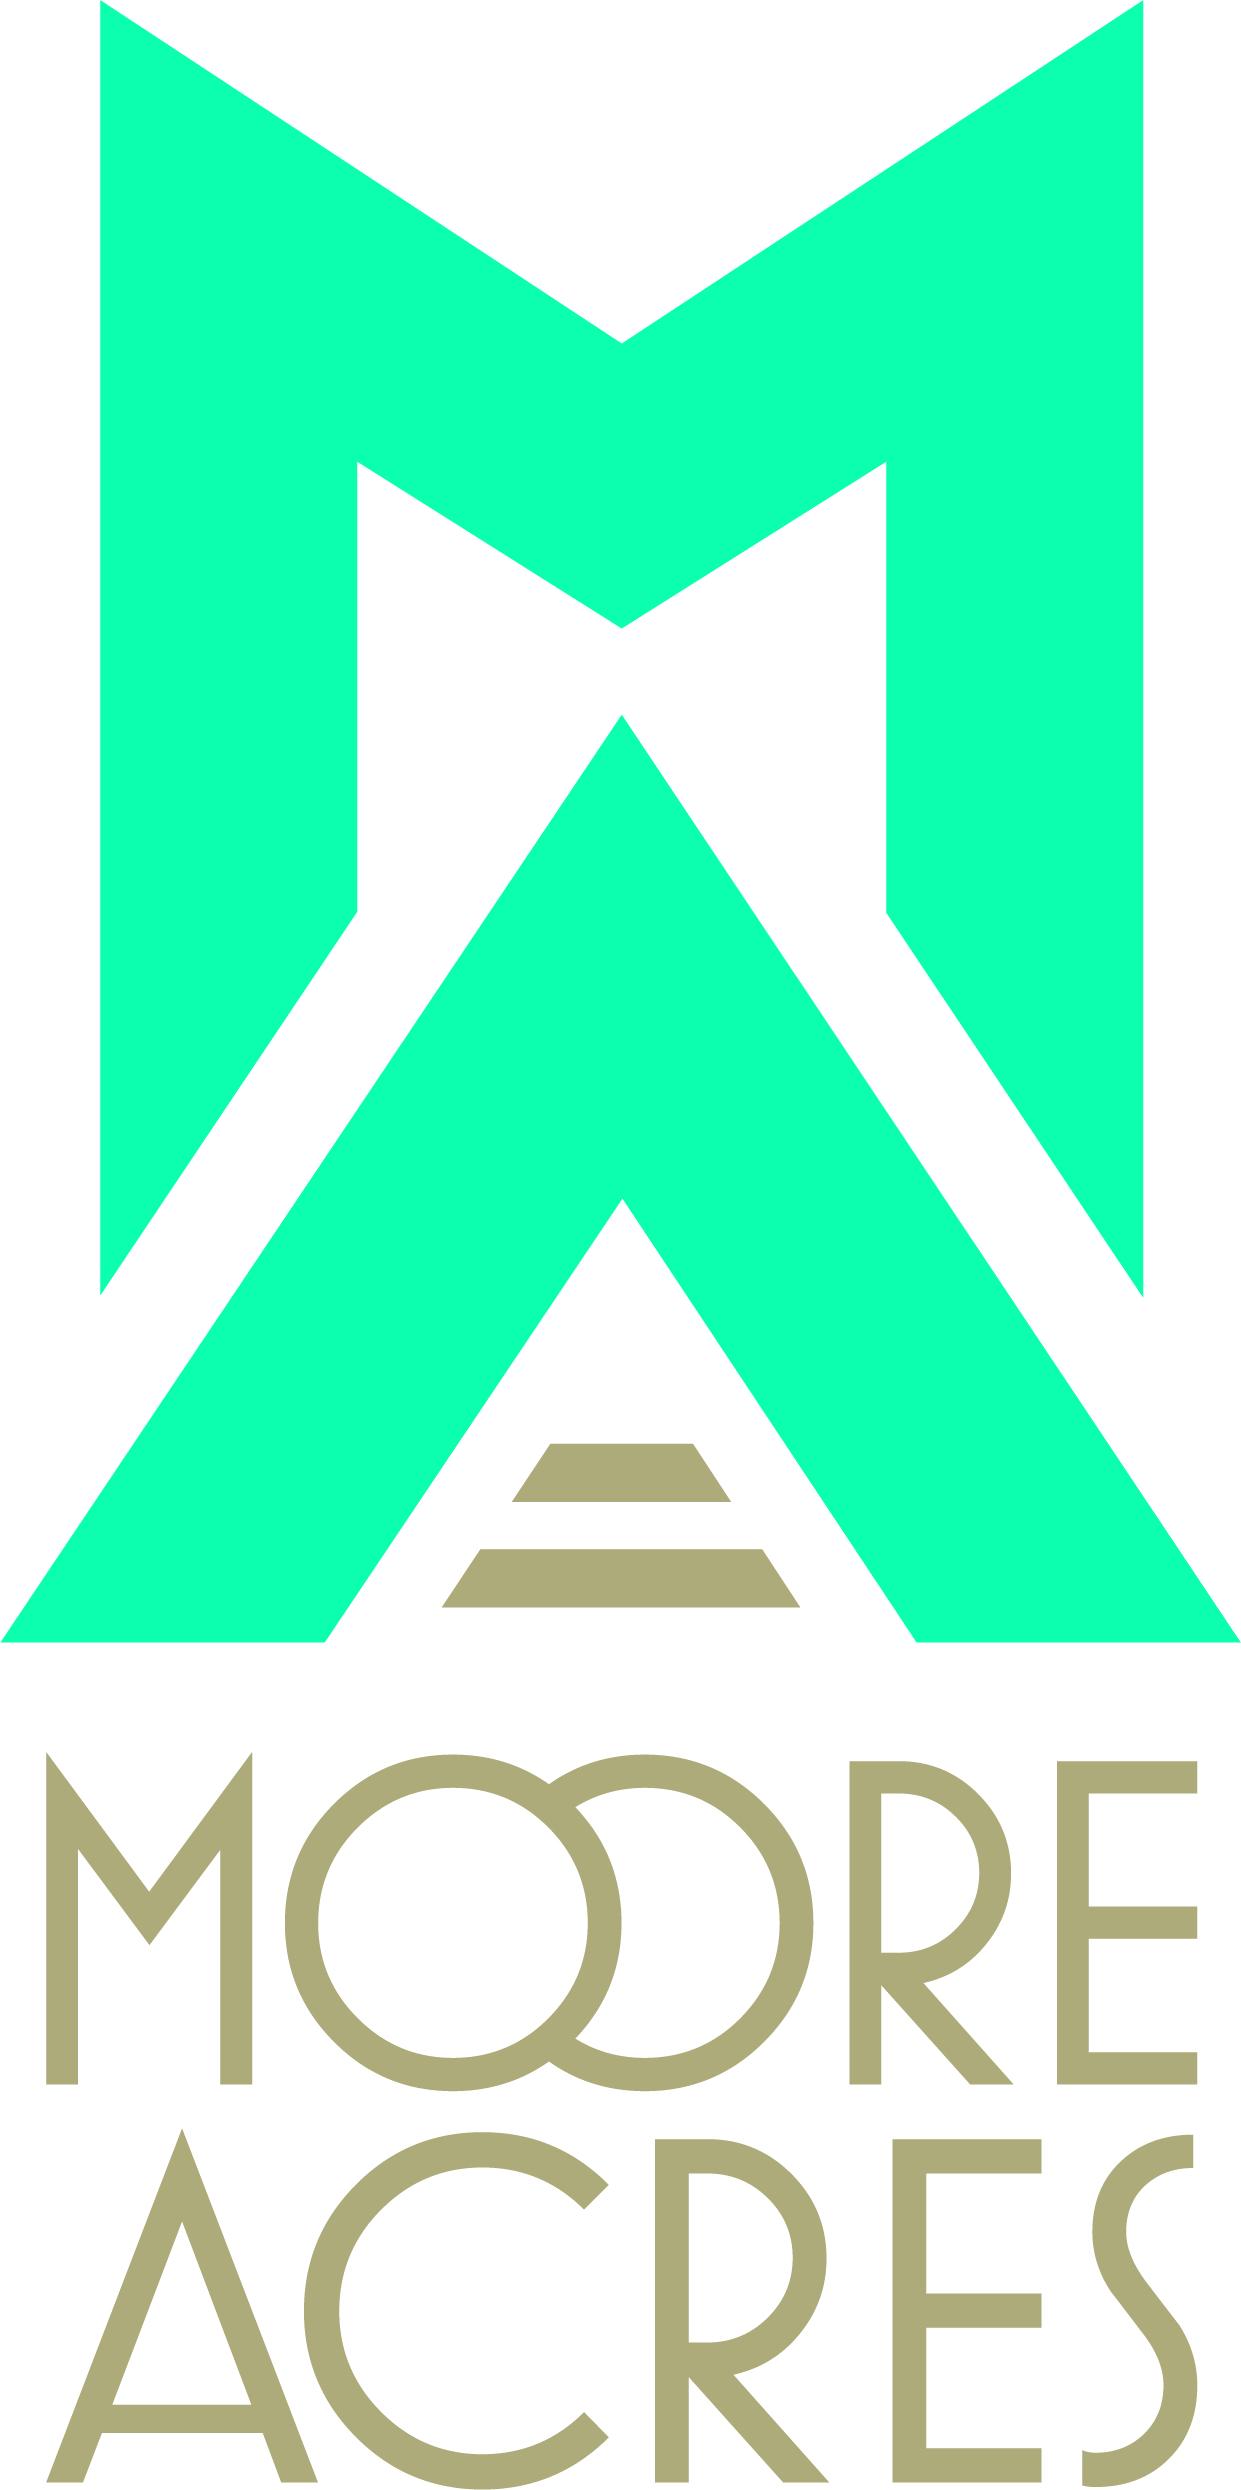 Moore Acres